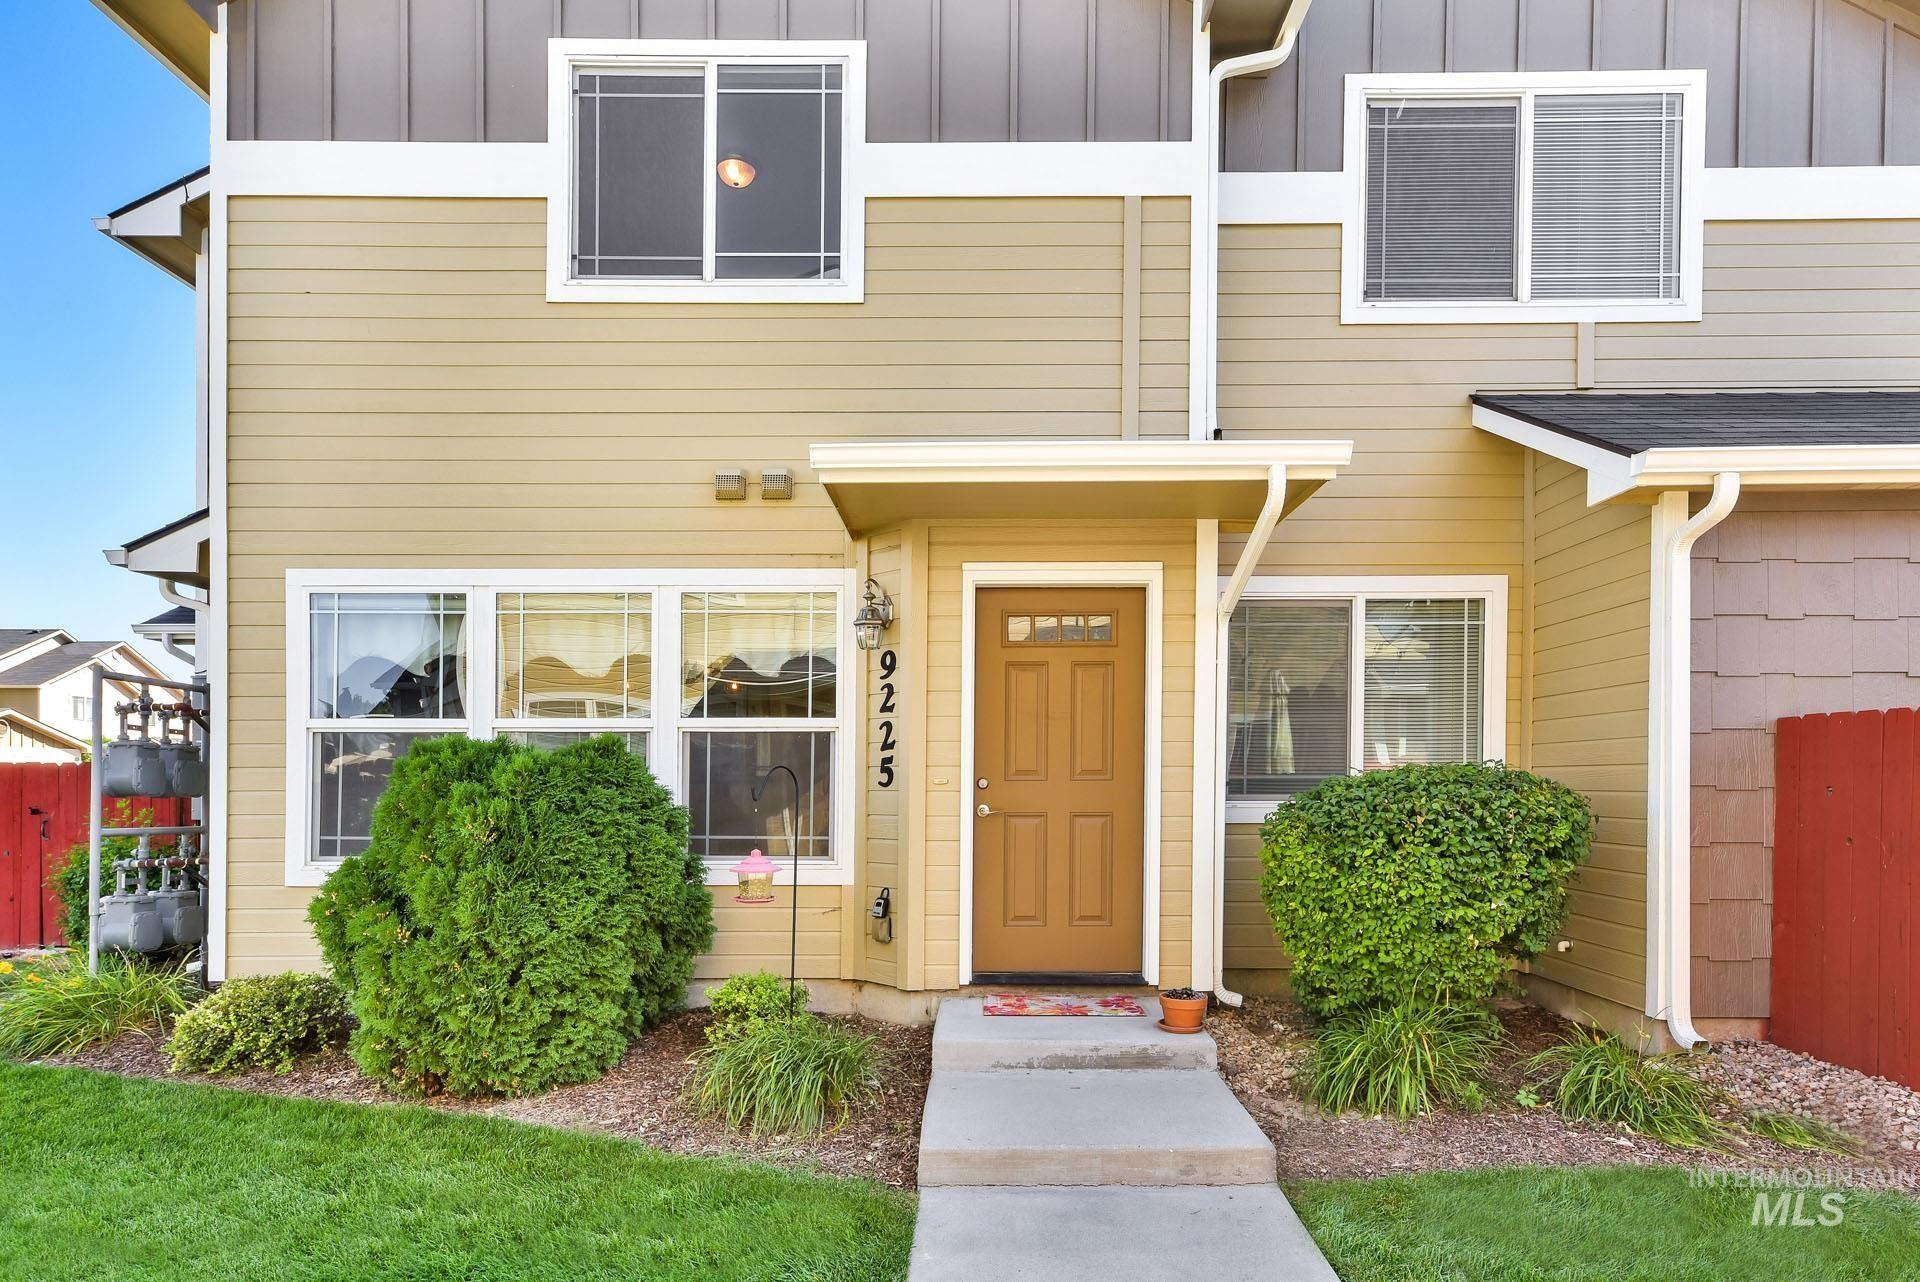 9225 W Brogan, Boise, ID 83709 - MLS#: 98817193